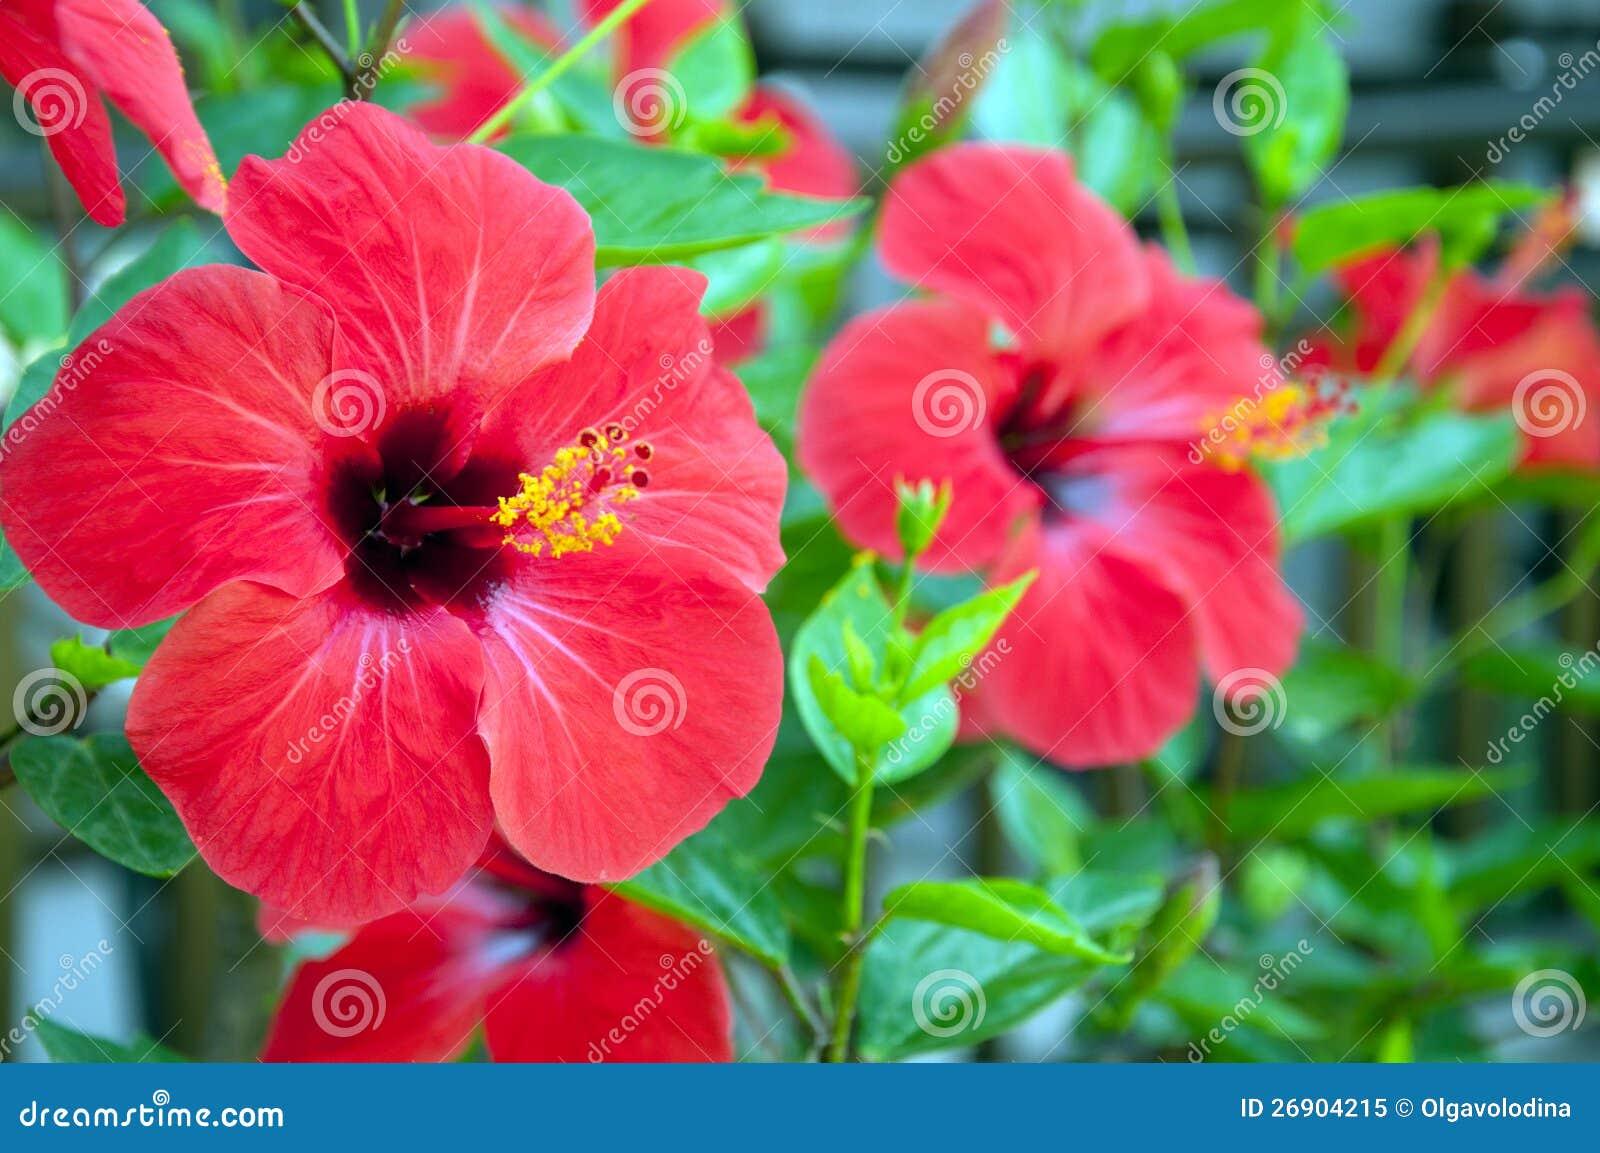 Fiori Grandi.Large Red Hibiscus Flowers Stock Image Image Of Flowering 26904215